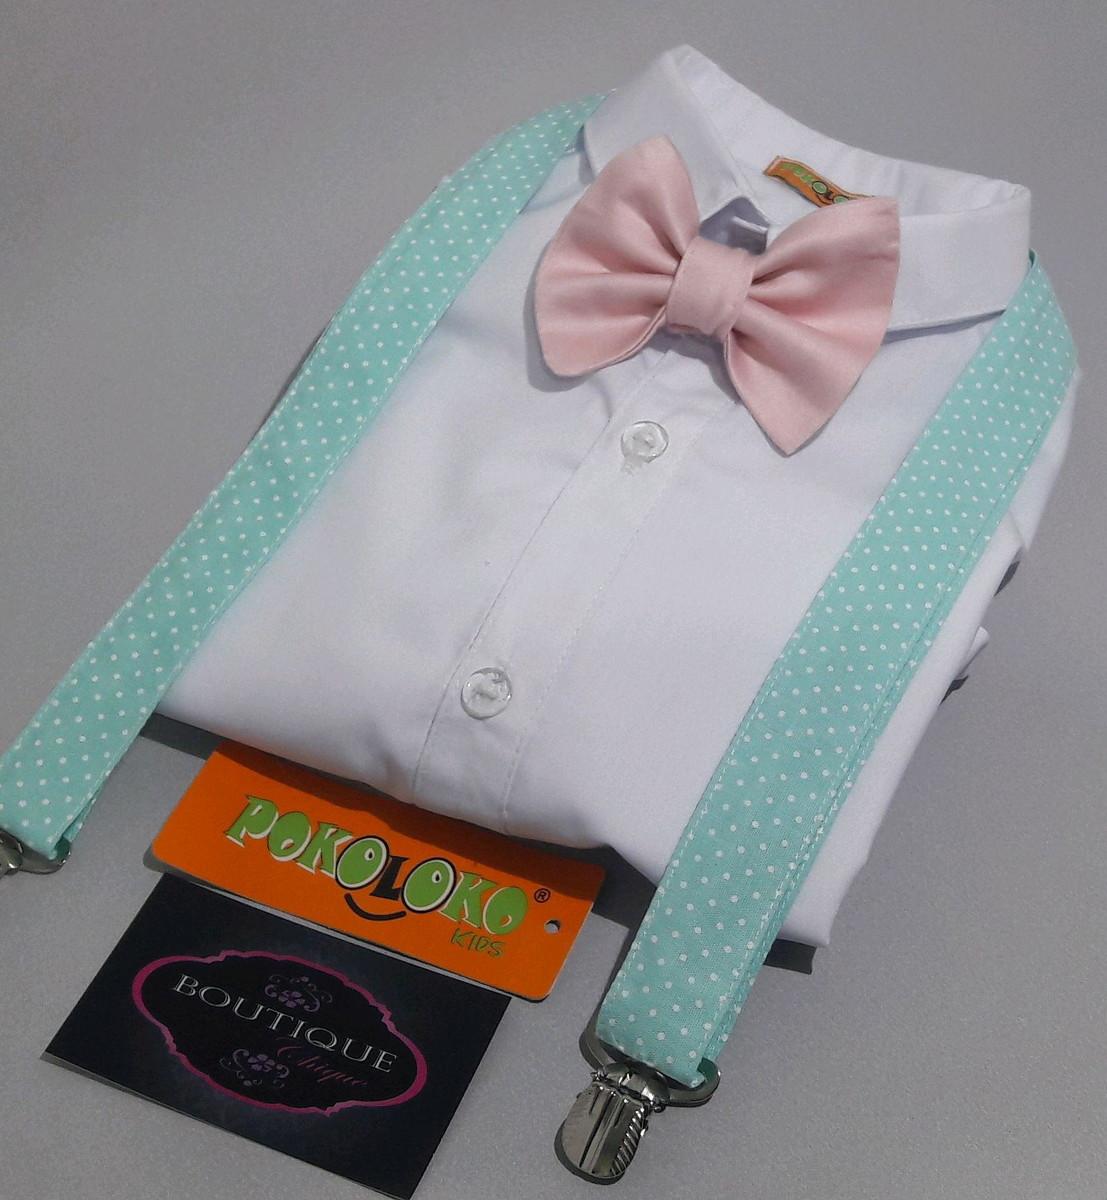 b59a2ccdda Camisa Branca Social Infantil+Gravata e suspensorio no Elo7 ...